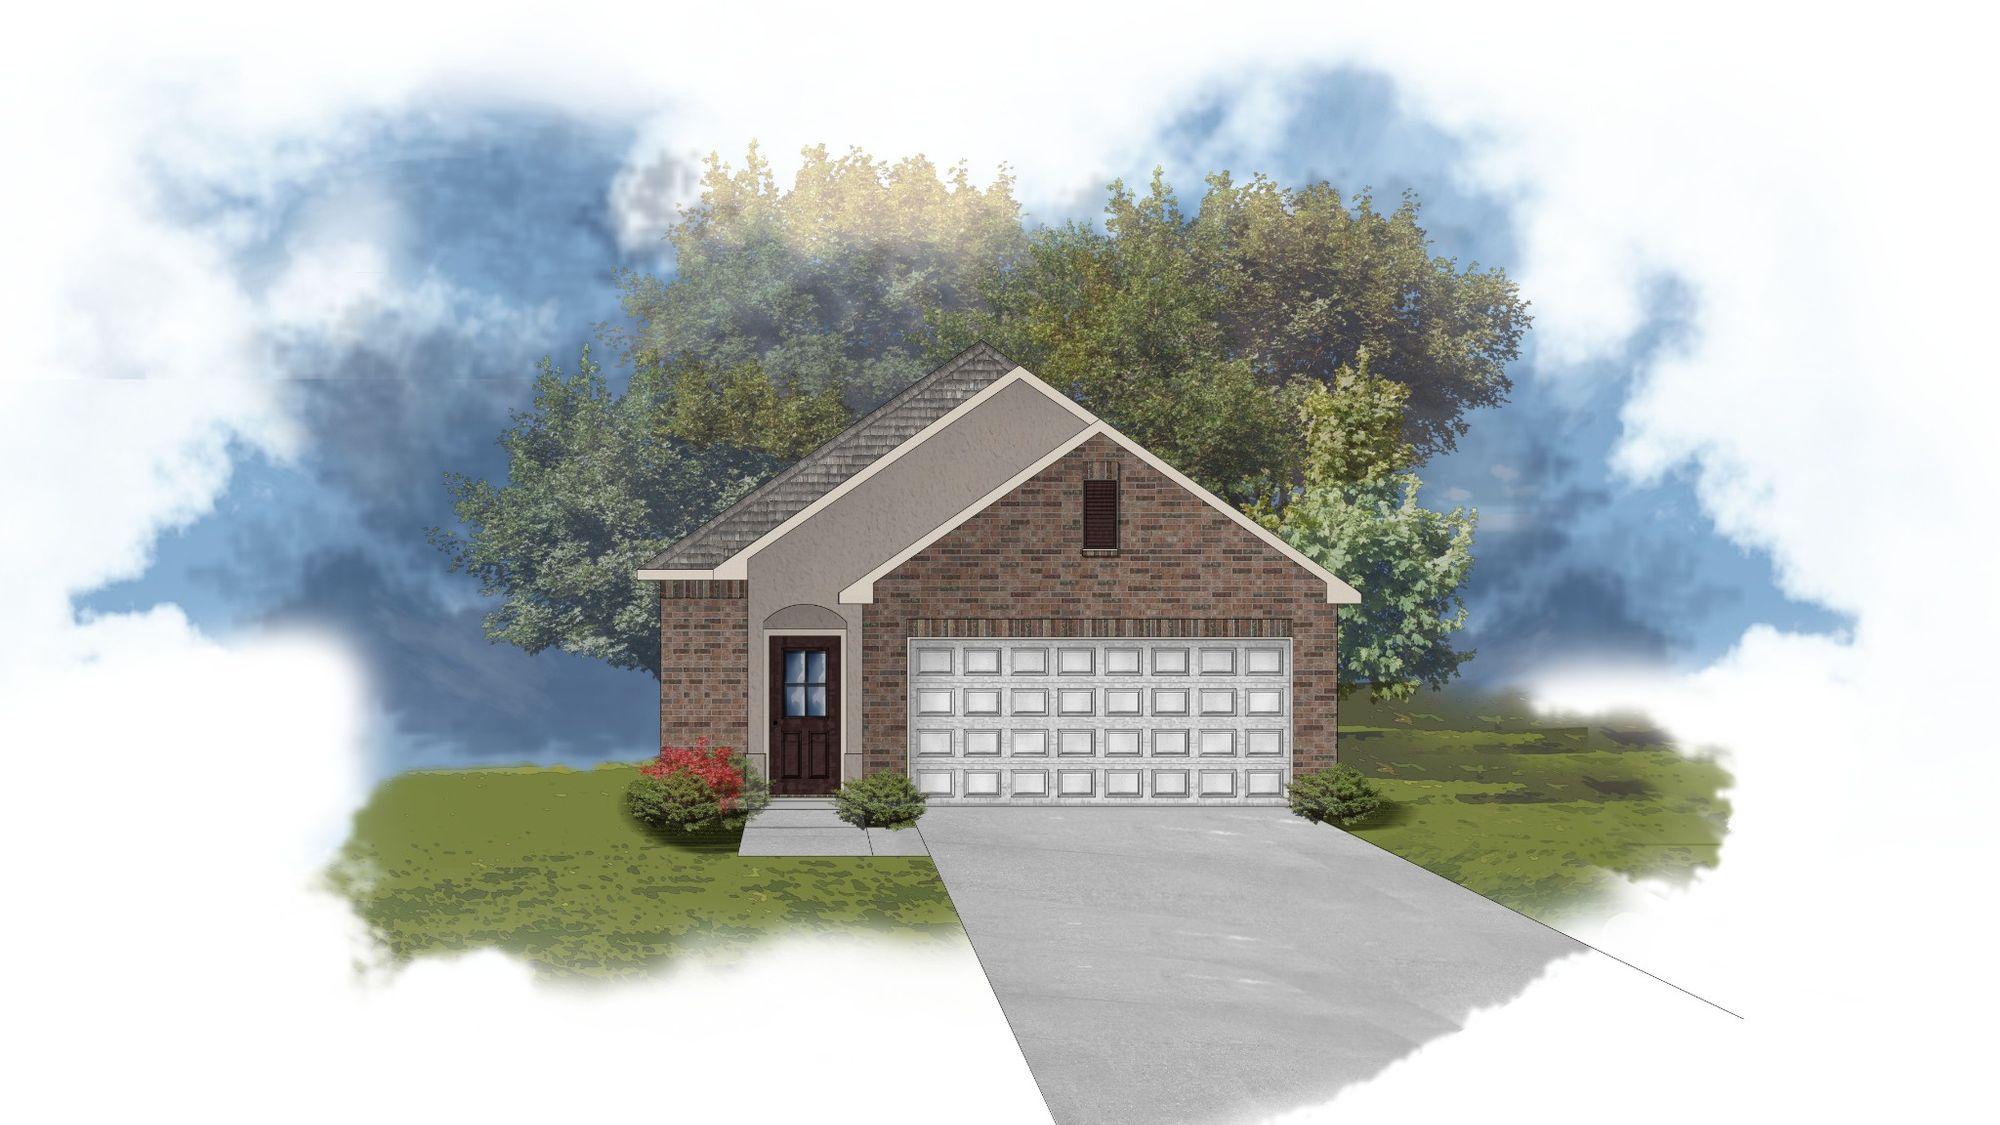 Lewis II A Floorplan Exterior Elevation Image - Open Floor Plan - DSLD Homes